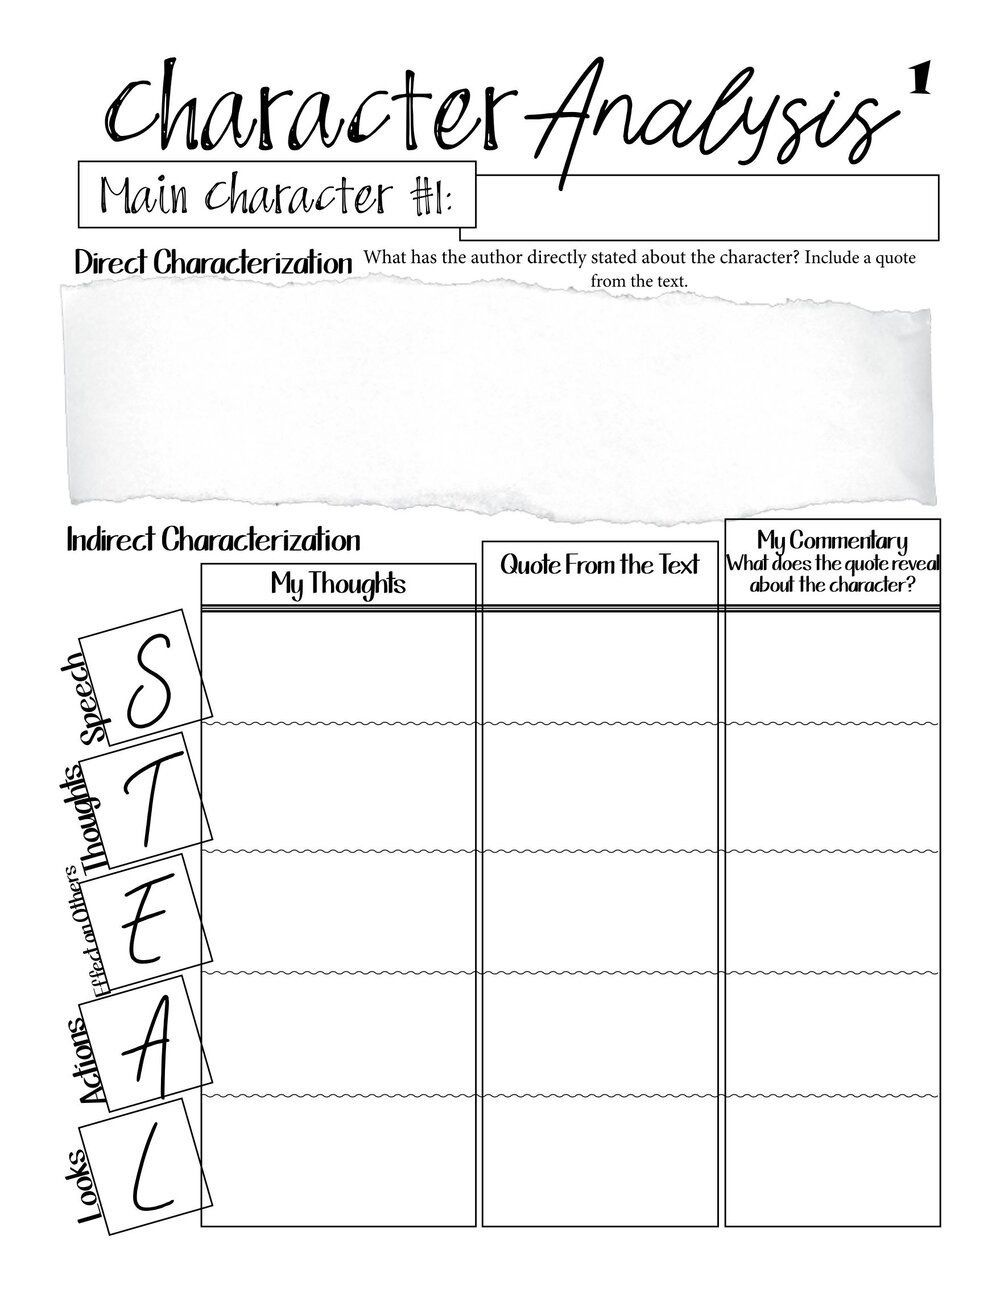 Character Analysis Worksheet High School 10 Mini Lessons